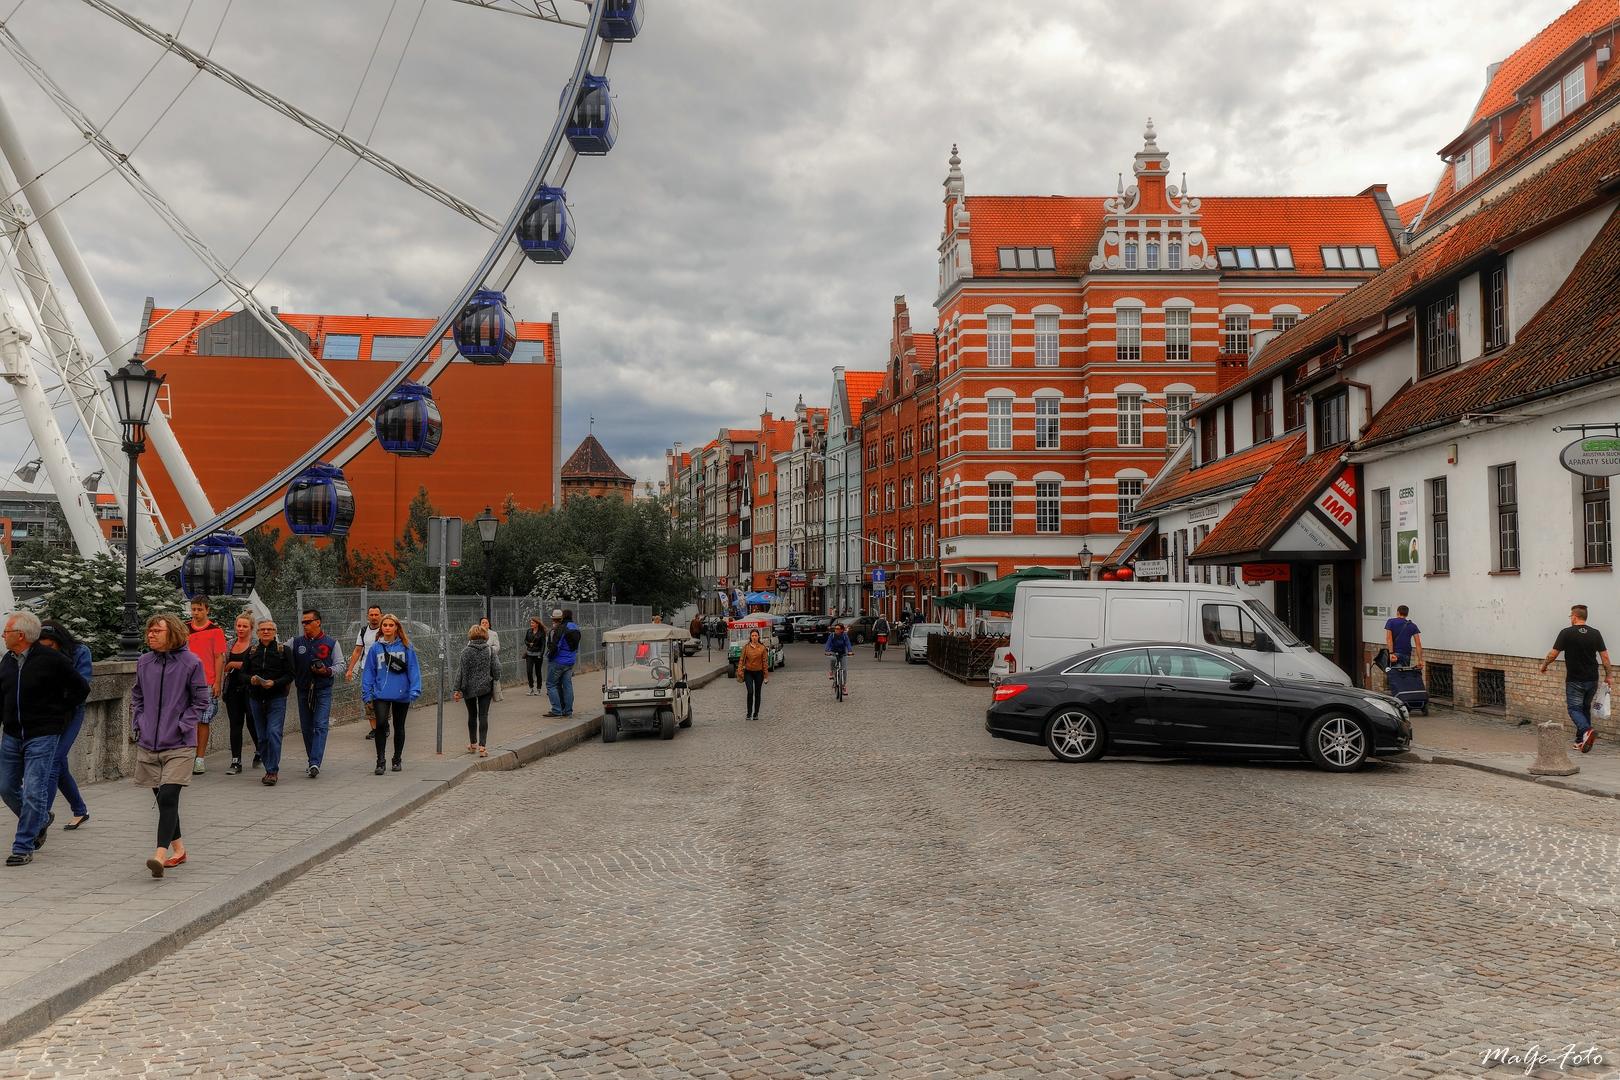 Gdansk - Sur le chemin de la vieille ville / Danzig - Auf dem Weg in die Altstadt